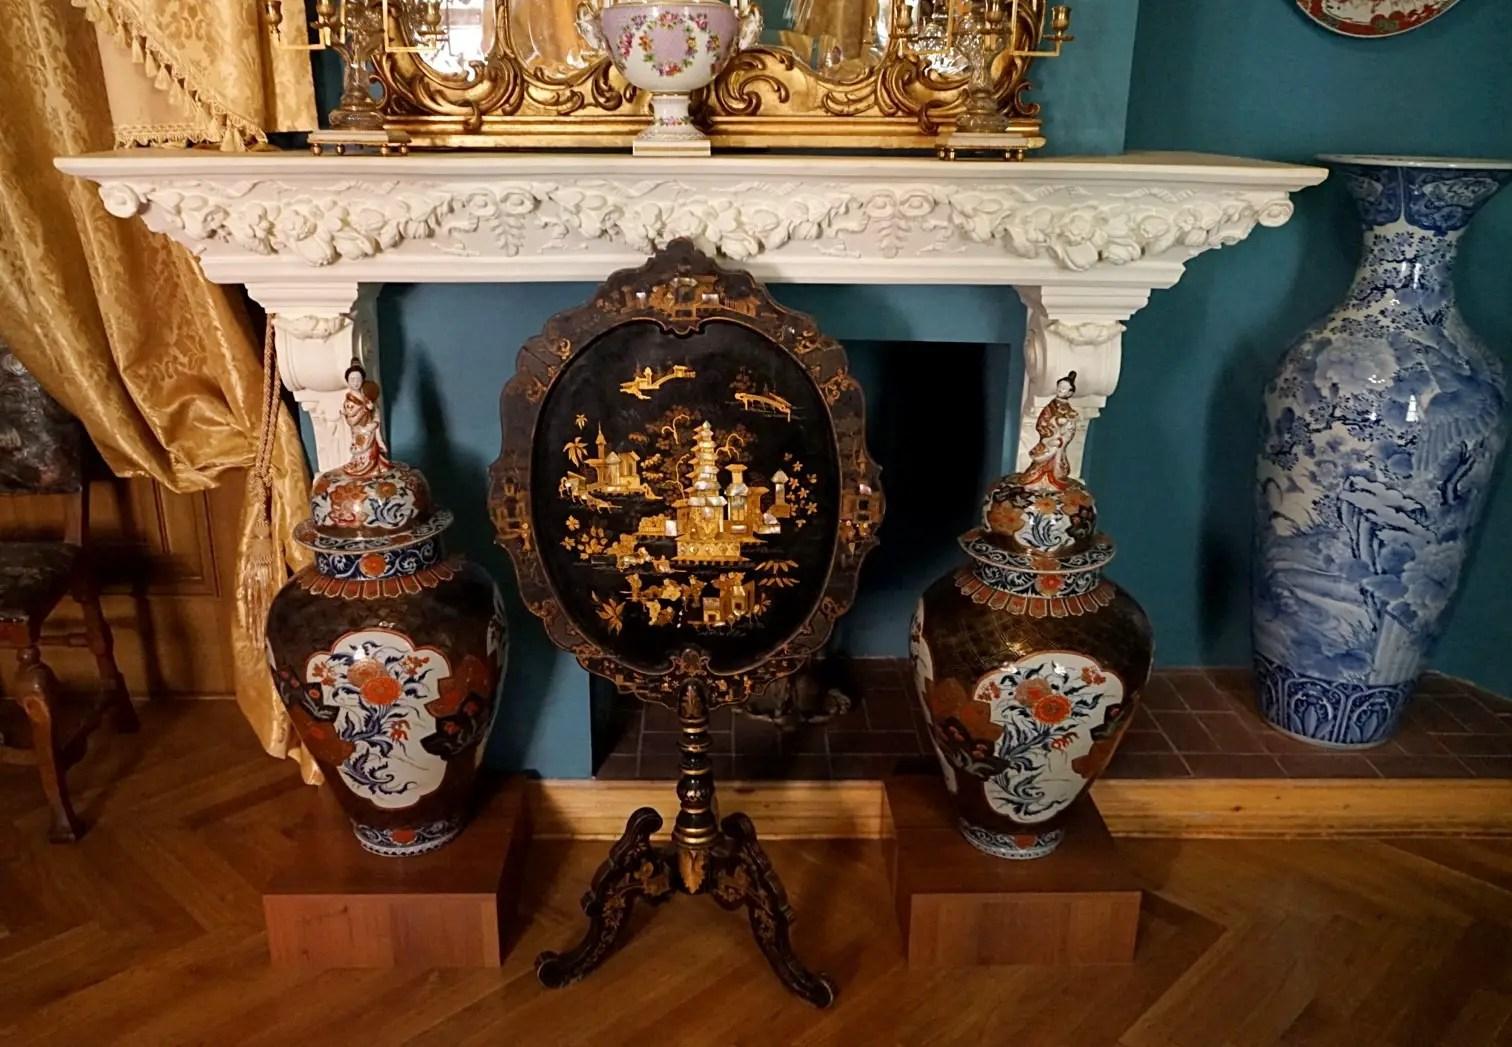 Inside Bandinelli palace in Lviv. Lviv museums